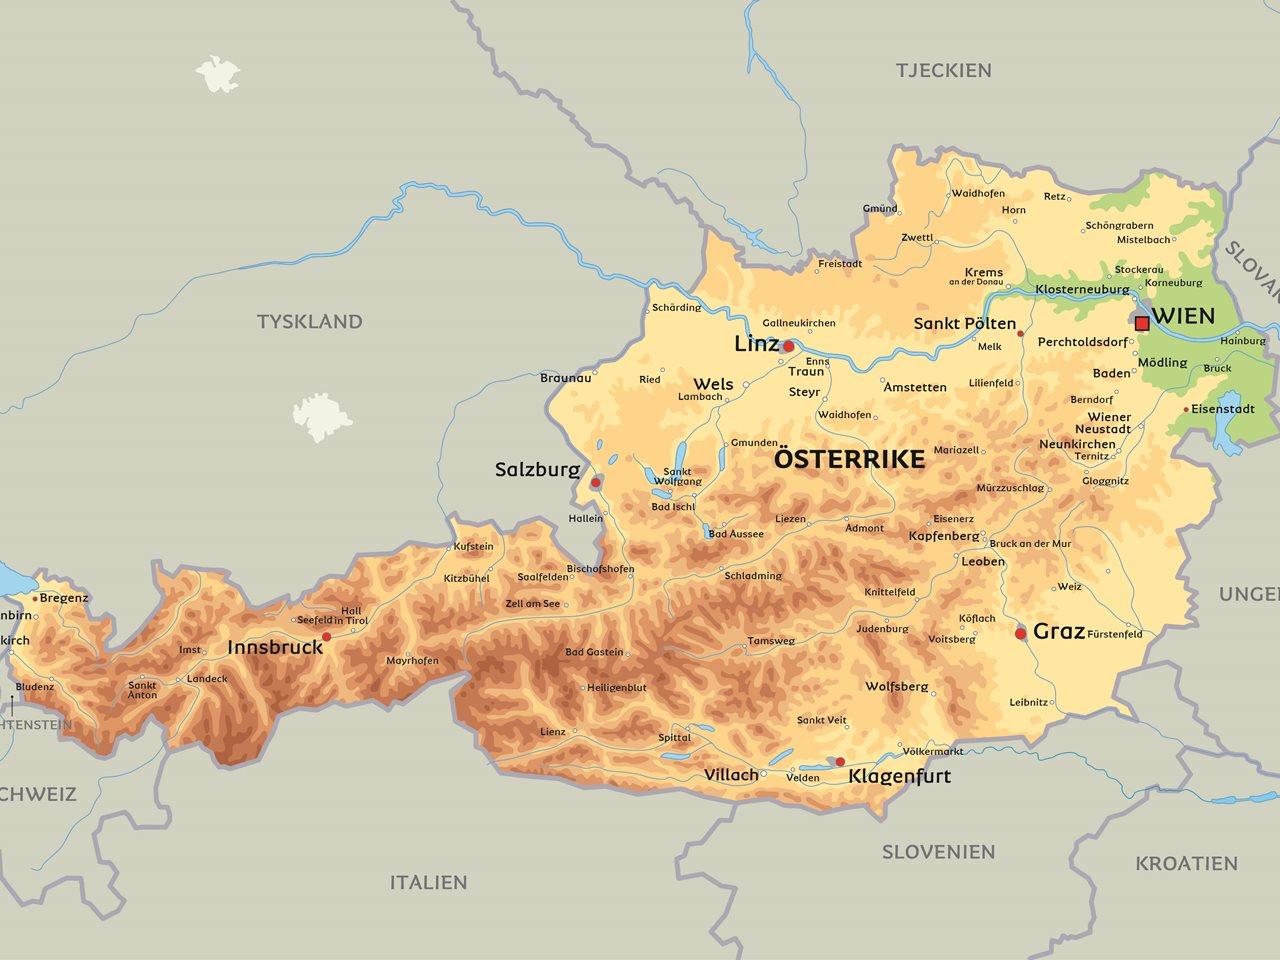 Karta Osterrike Se Bland Annat Huvudstaden Wien